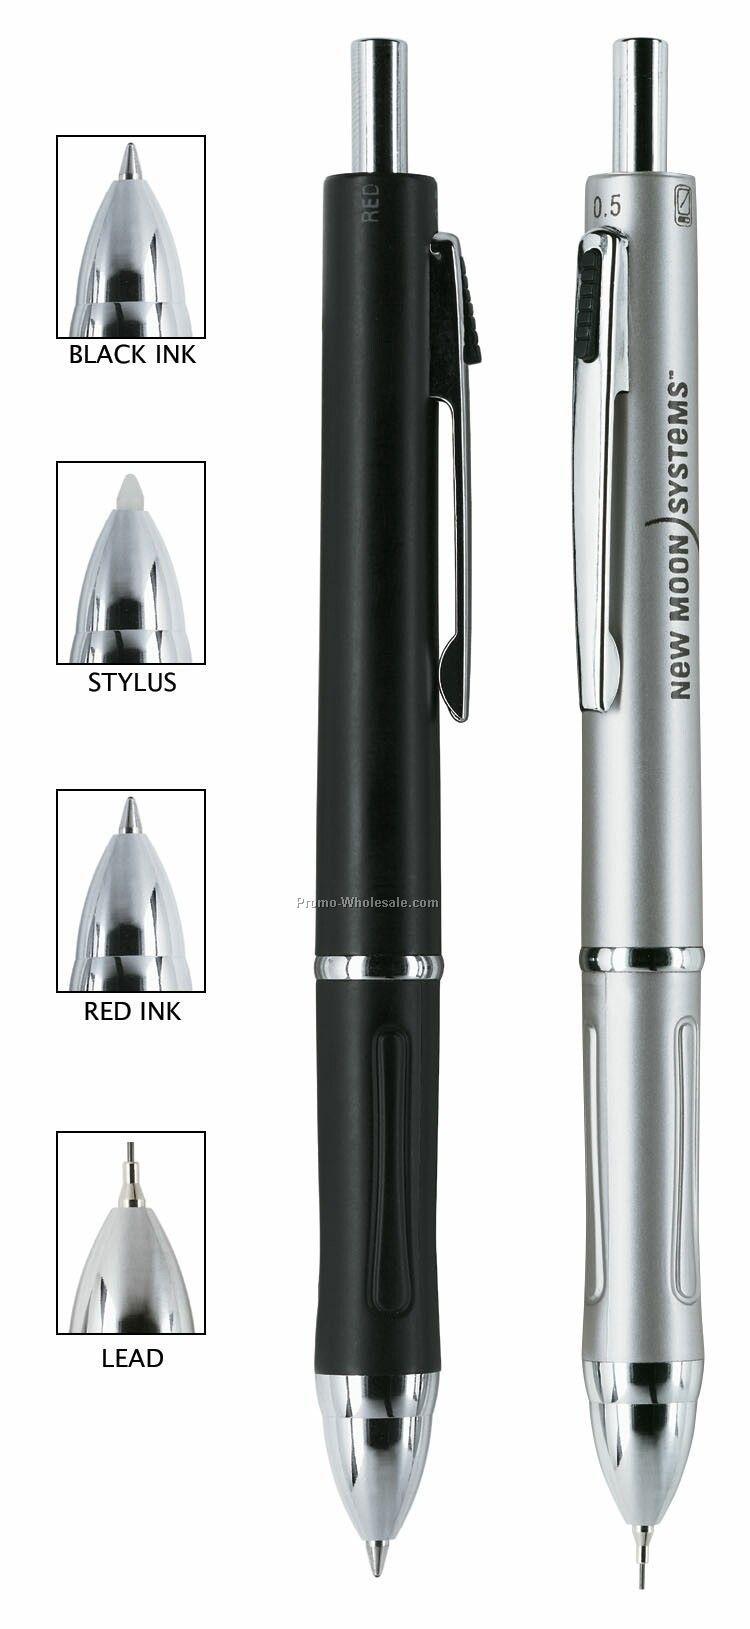 Silver 4-in-1 Creighton Ballpoint Pen/ Pencil/ Stylus